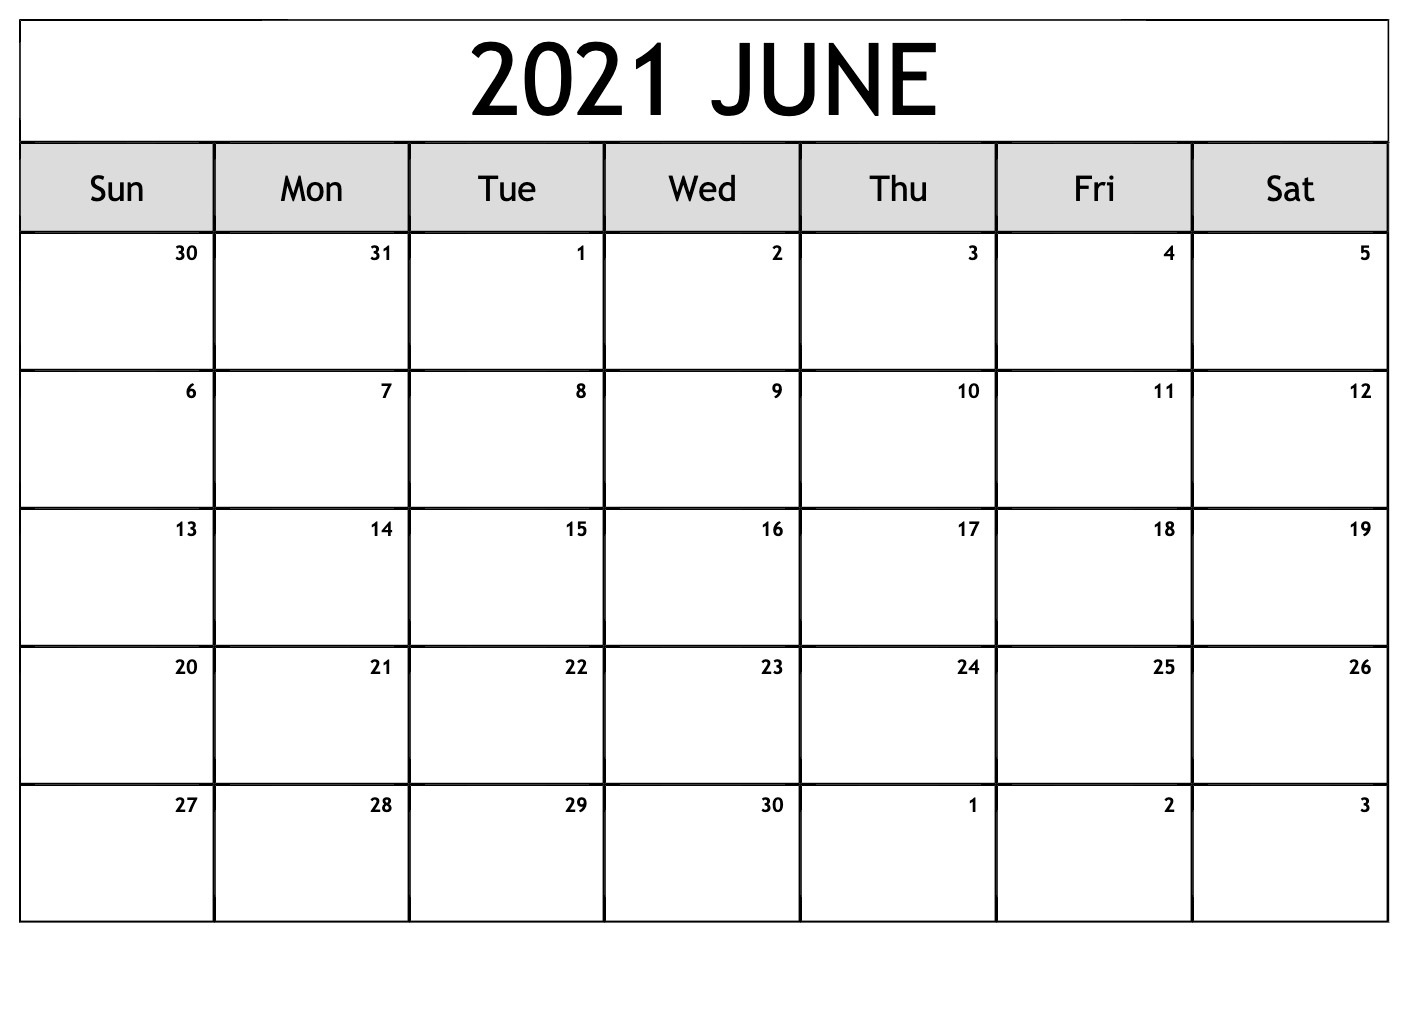 Blank June 2021 Calendar Make Schedule - Thecalendarpedia